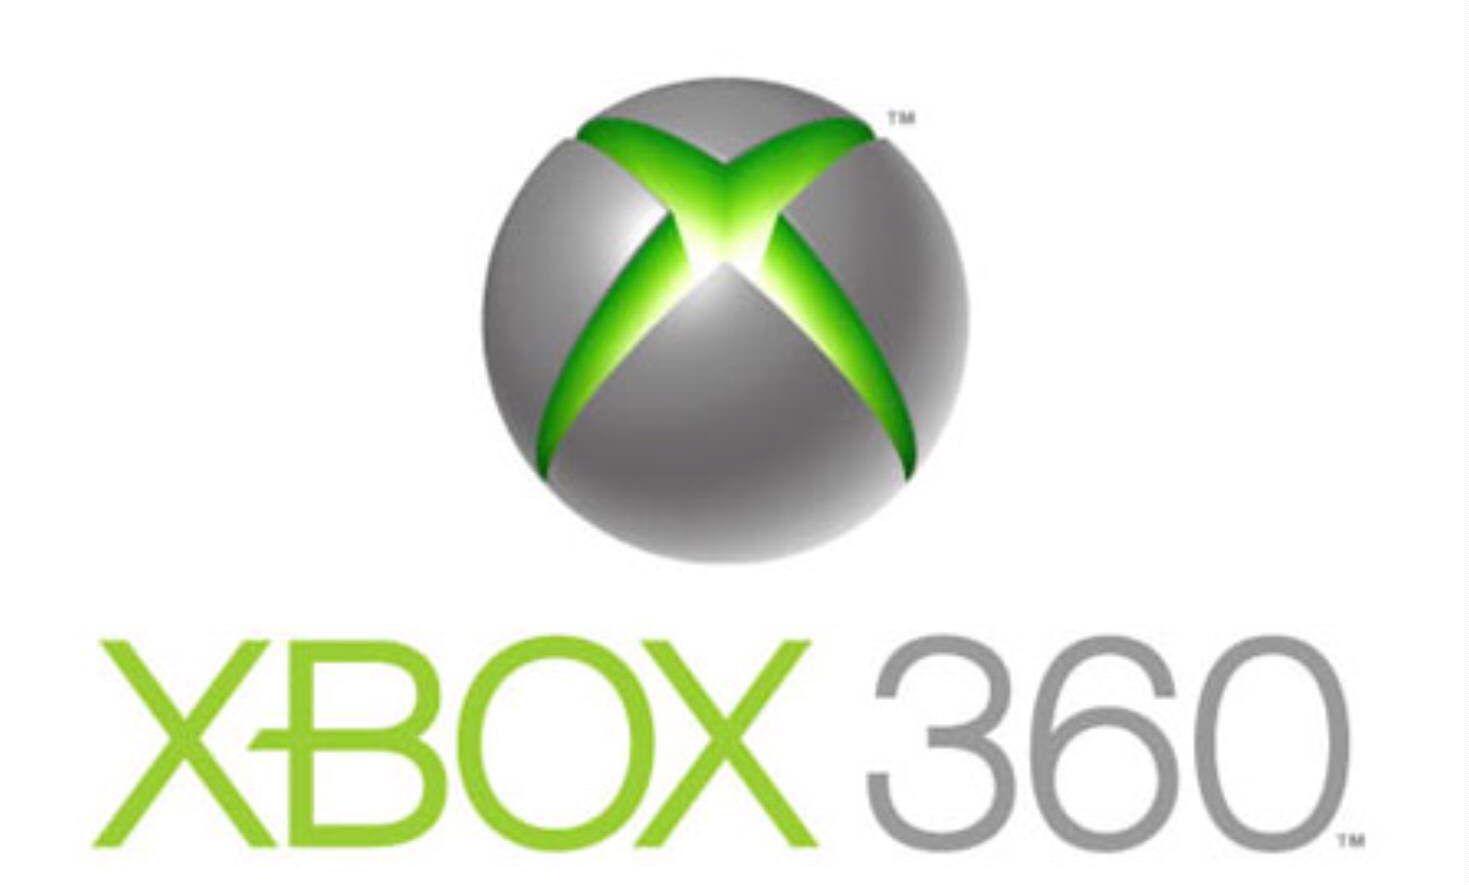 Pin By Madslug On Gaming Logos Xbox Games Xbox 360 Games Xbox Live